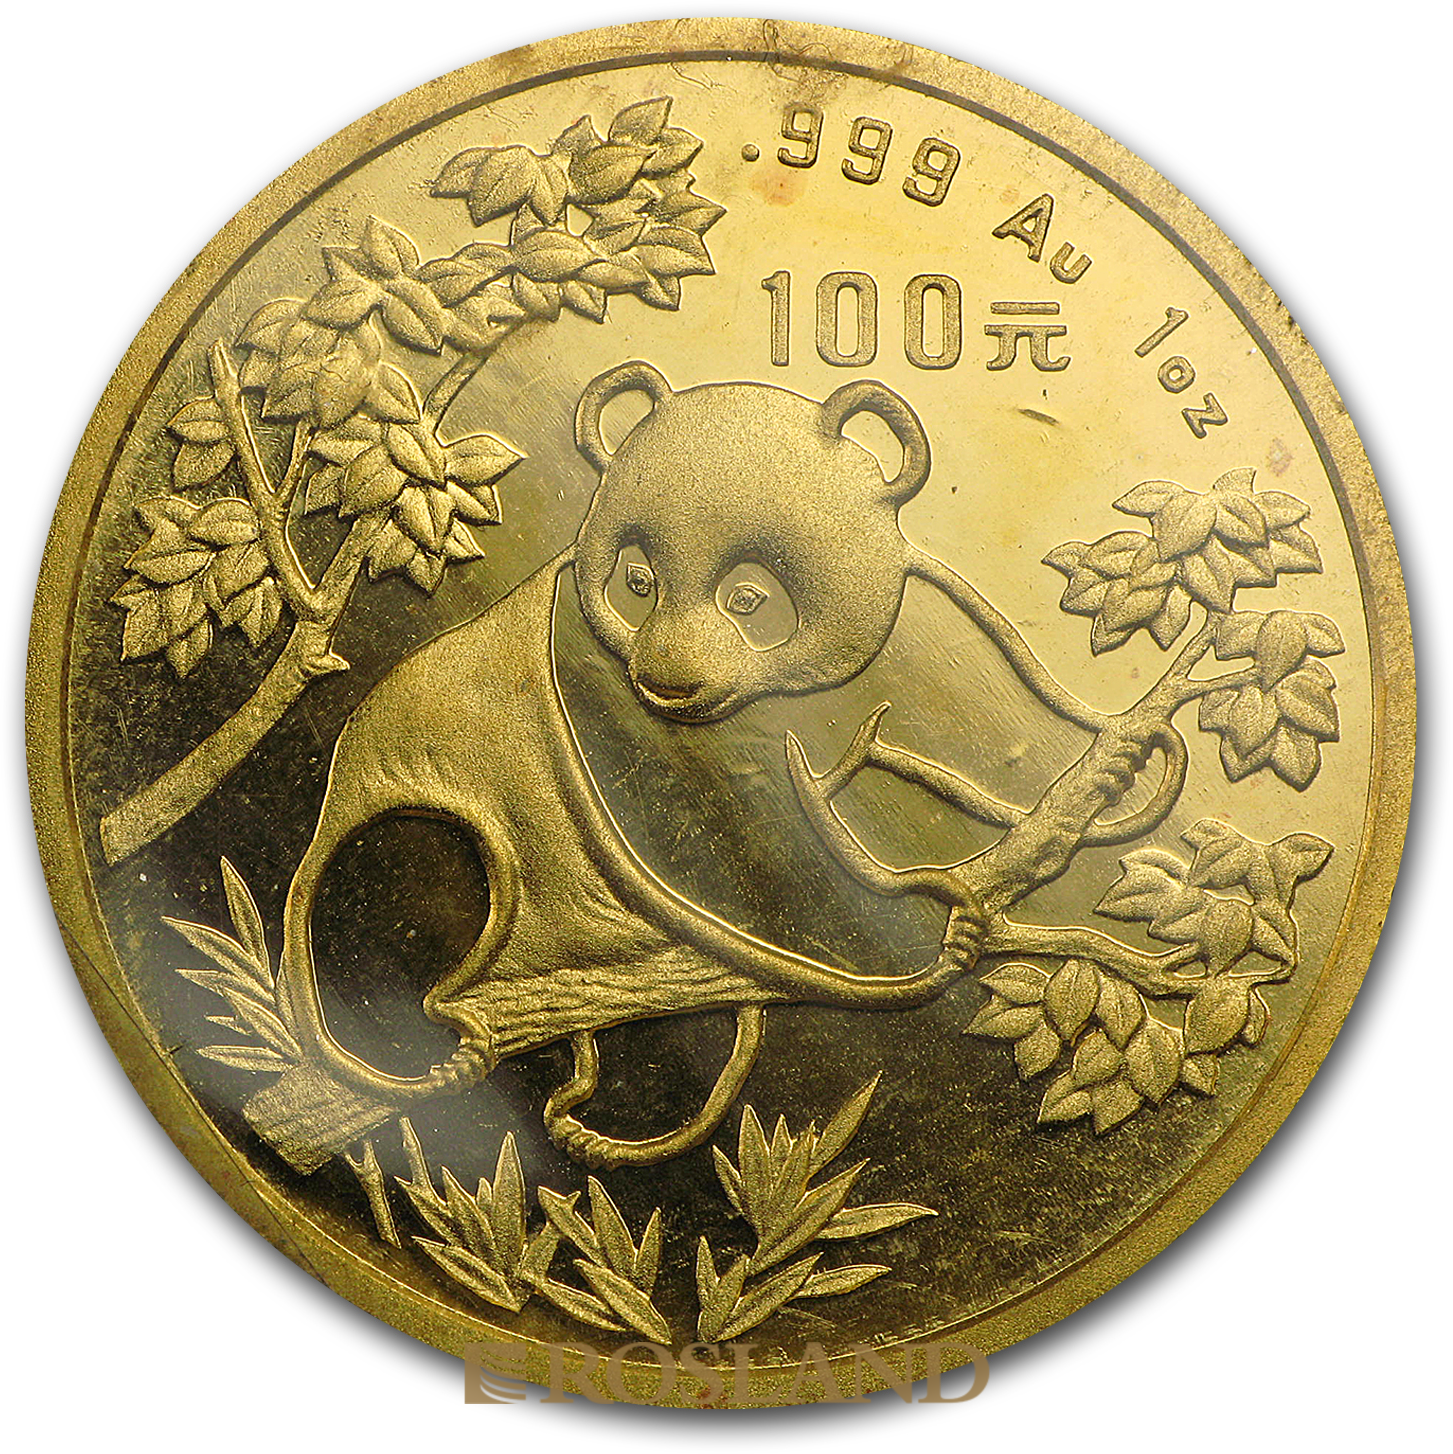 1 Unze Goldmünze China Panda 1992 (Großer Jahrgang)